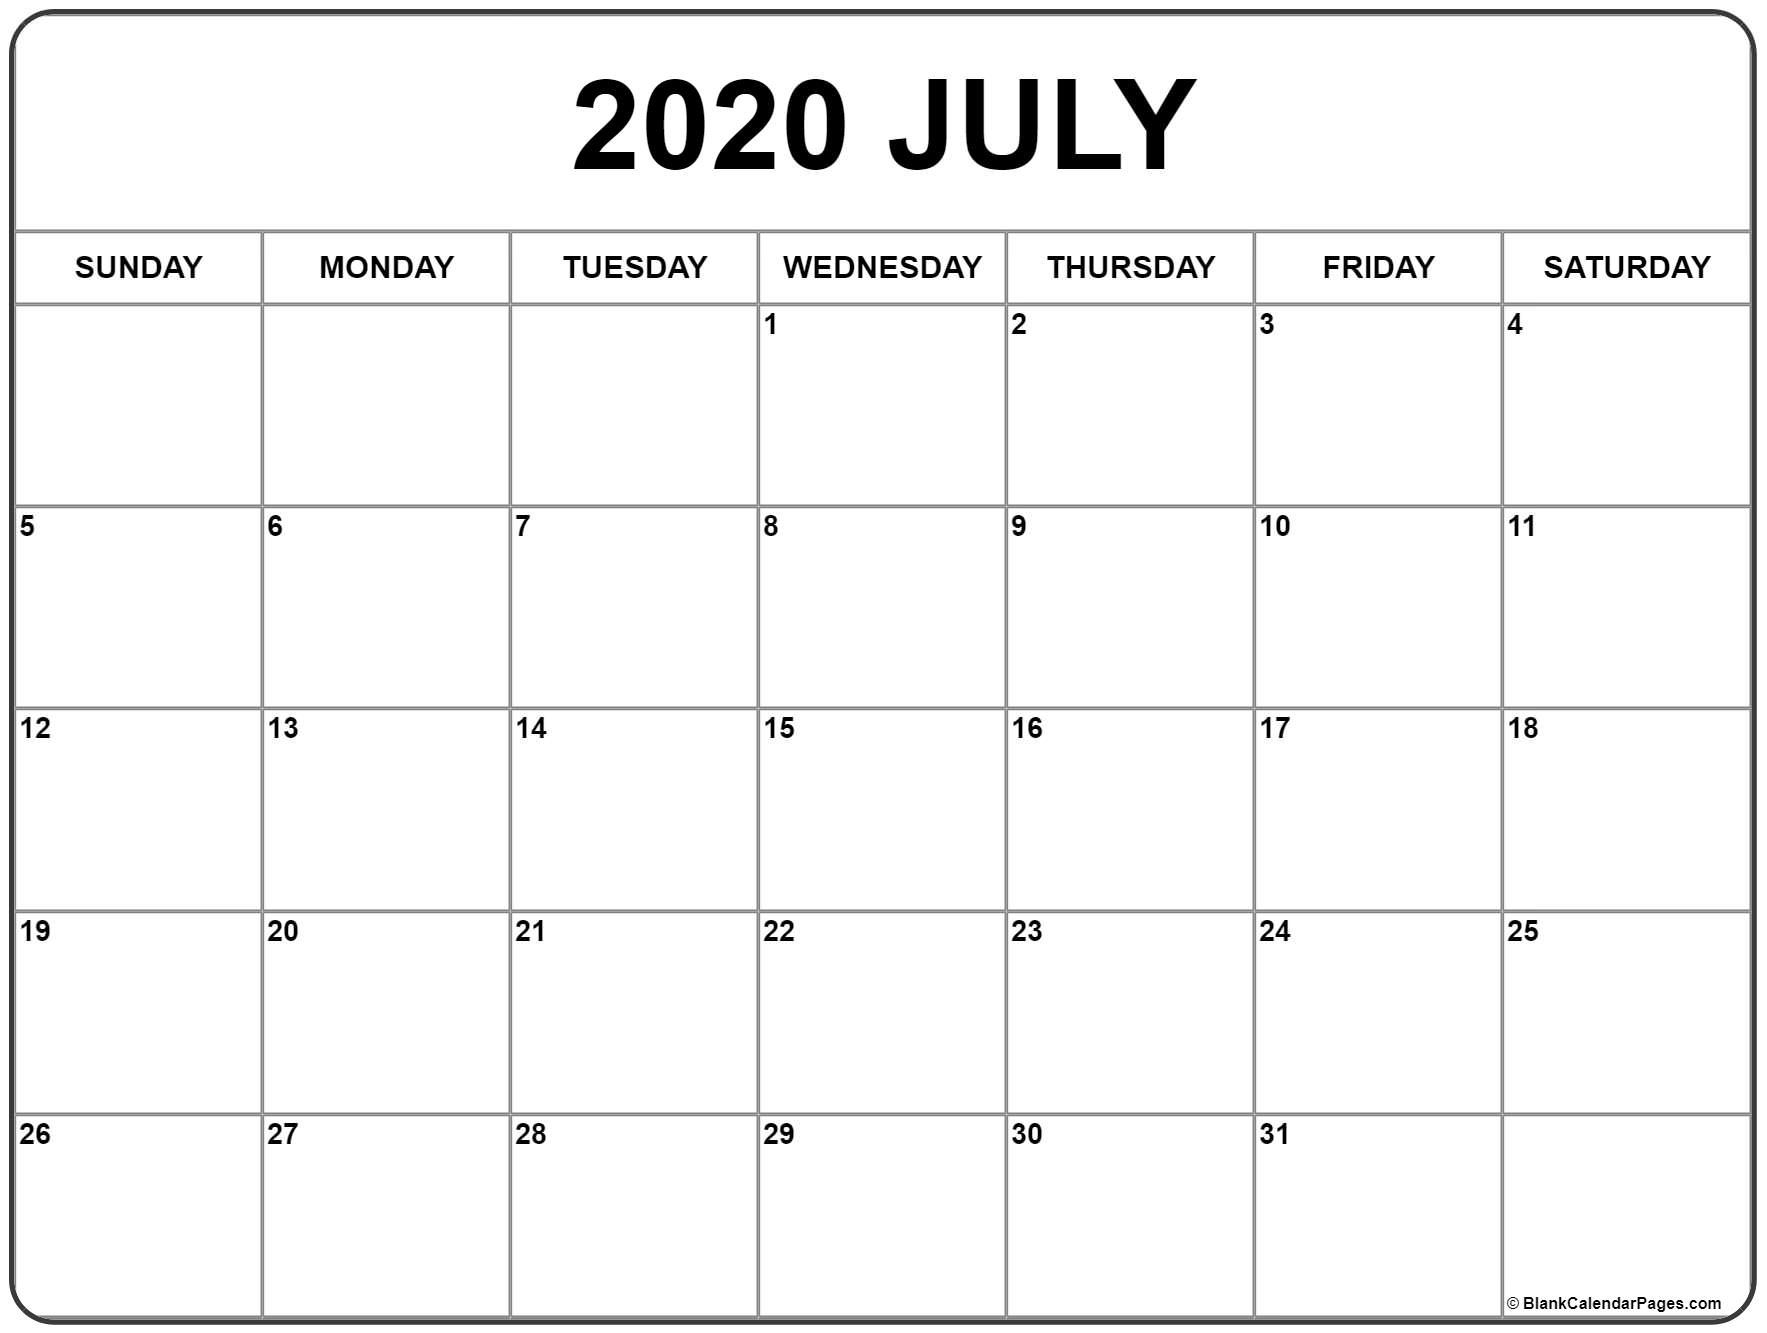 July #2020 #calendar | Printable Calendar Template, November